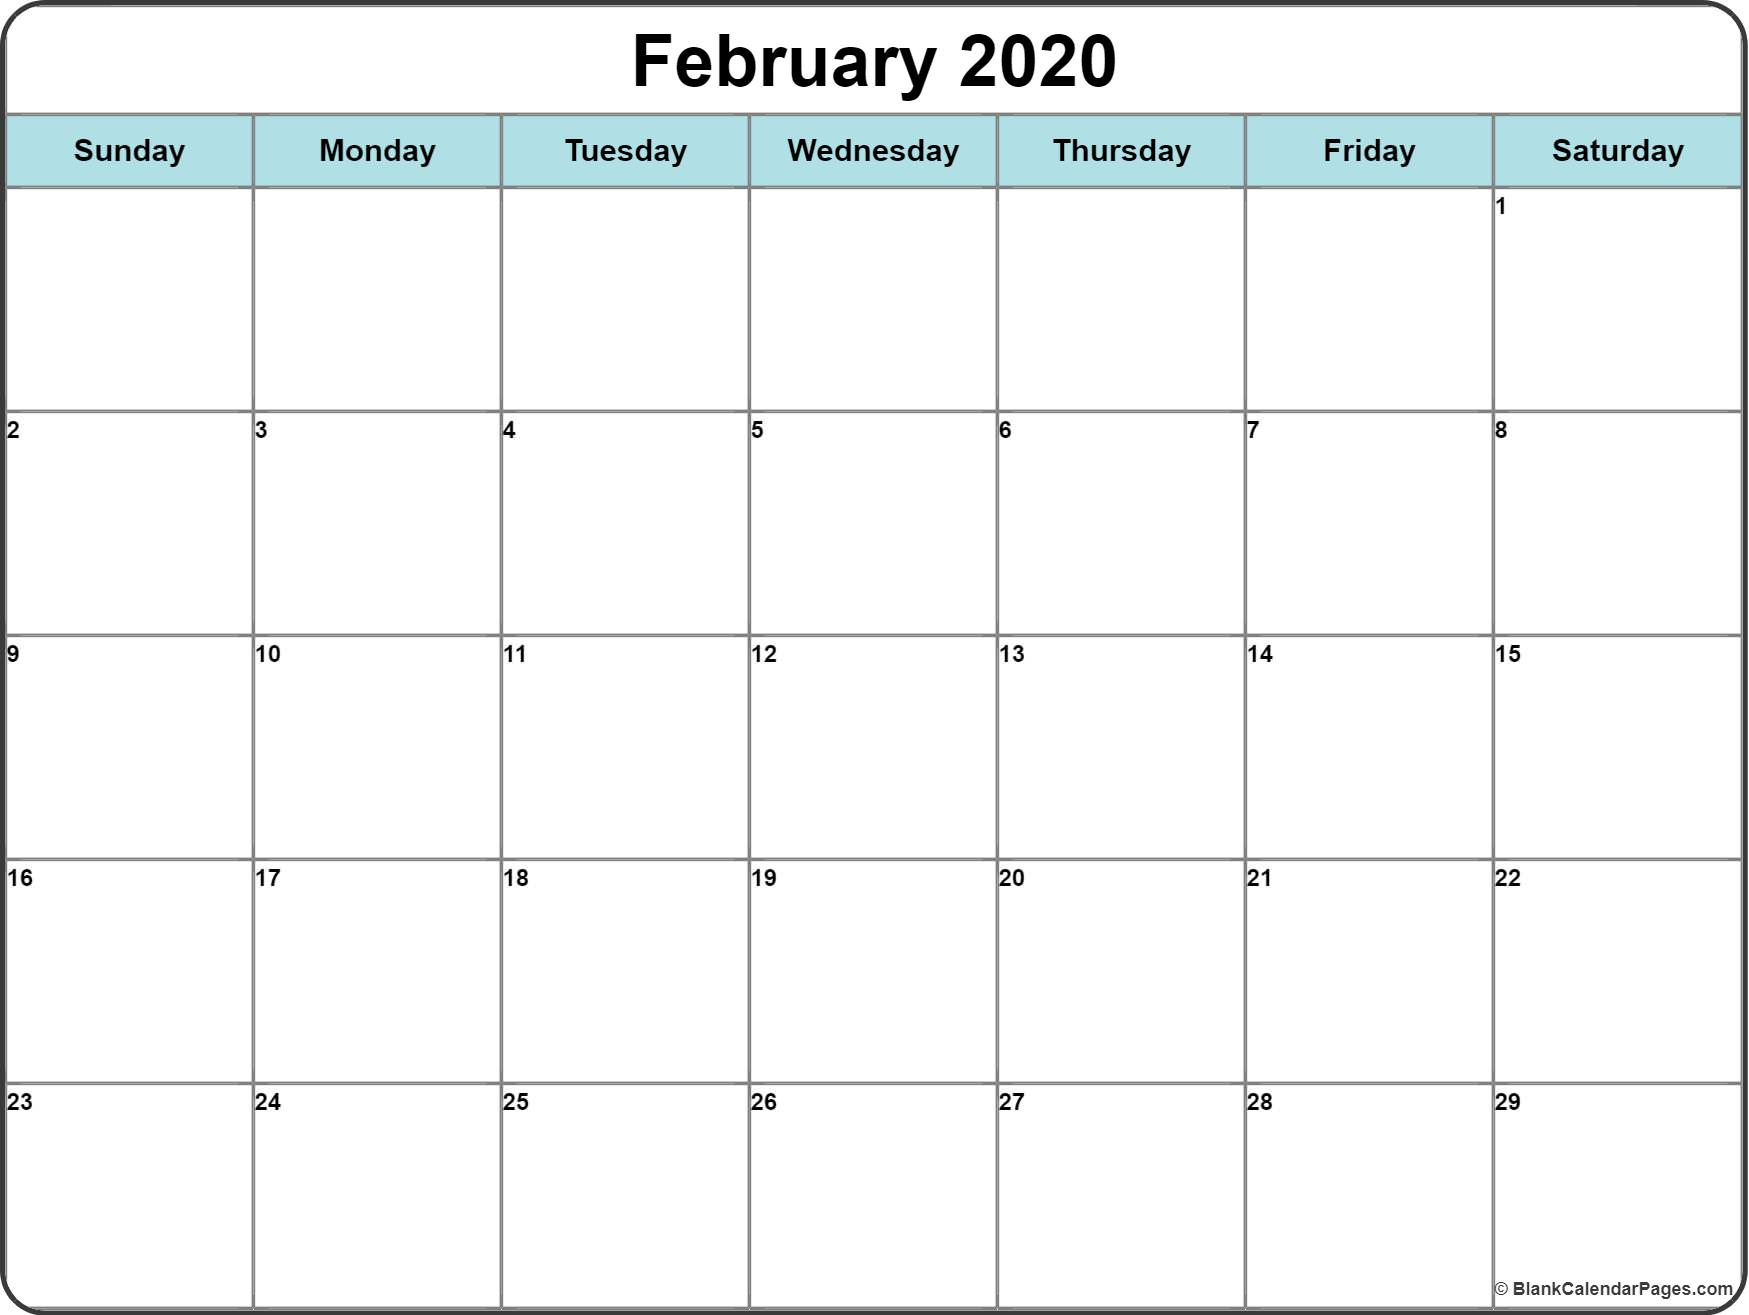 February 2020 Calendar | Free Printable Monthly Calendars regarding Free Printable 2020 Calendar With Space To Write